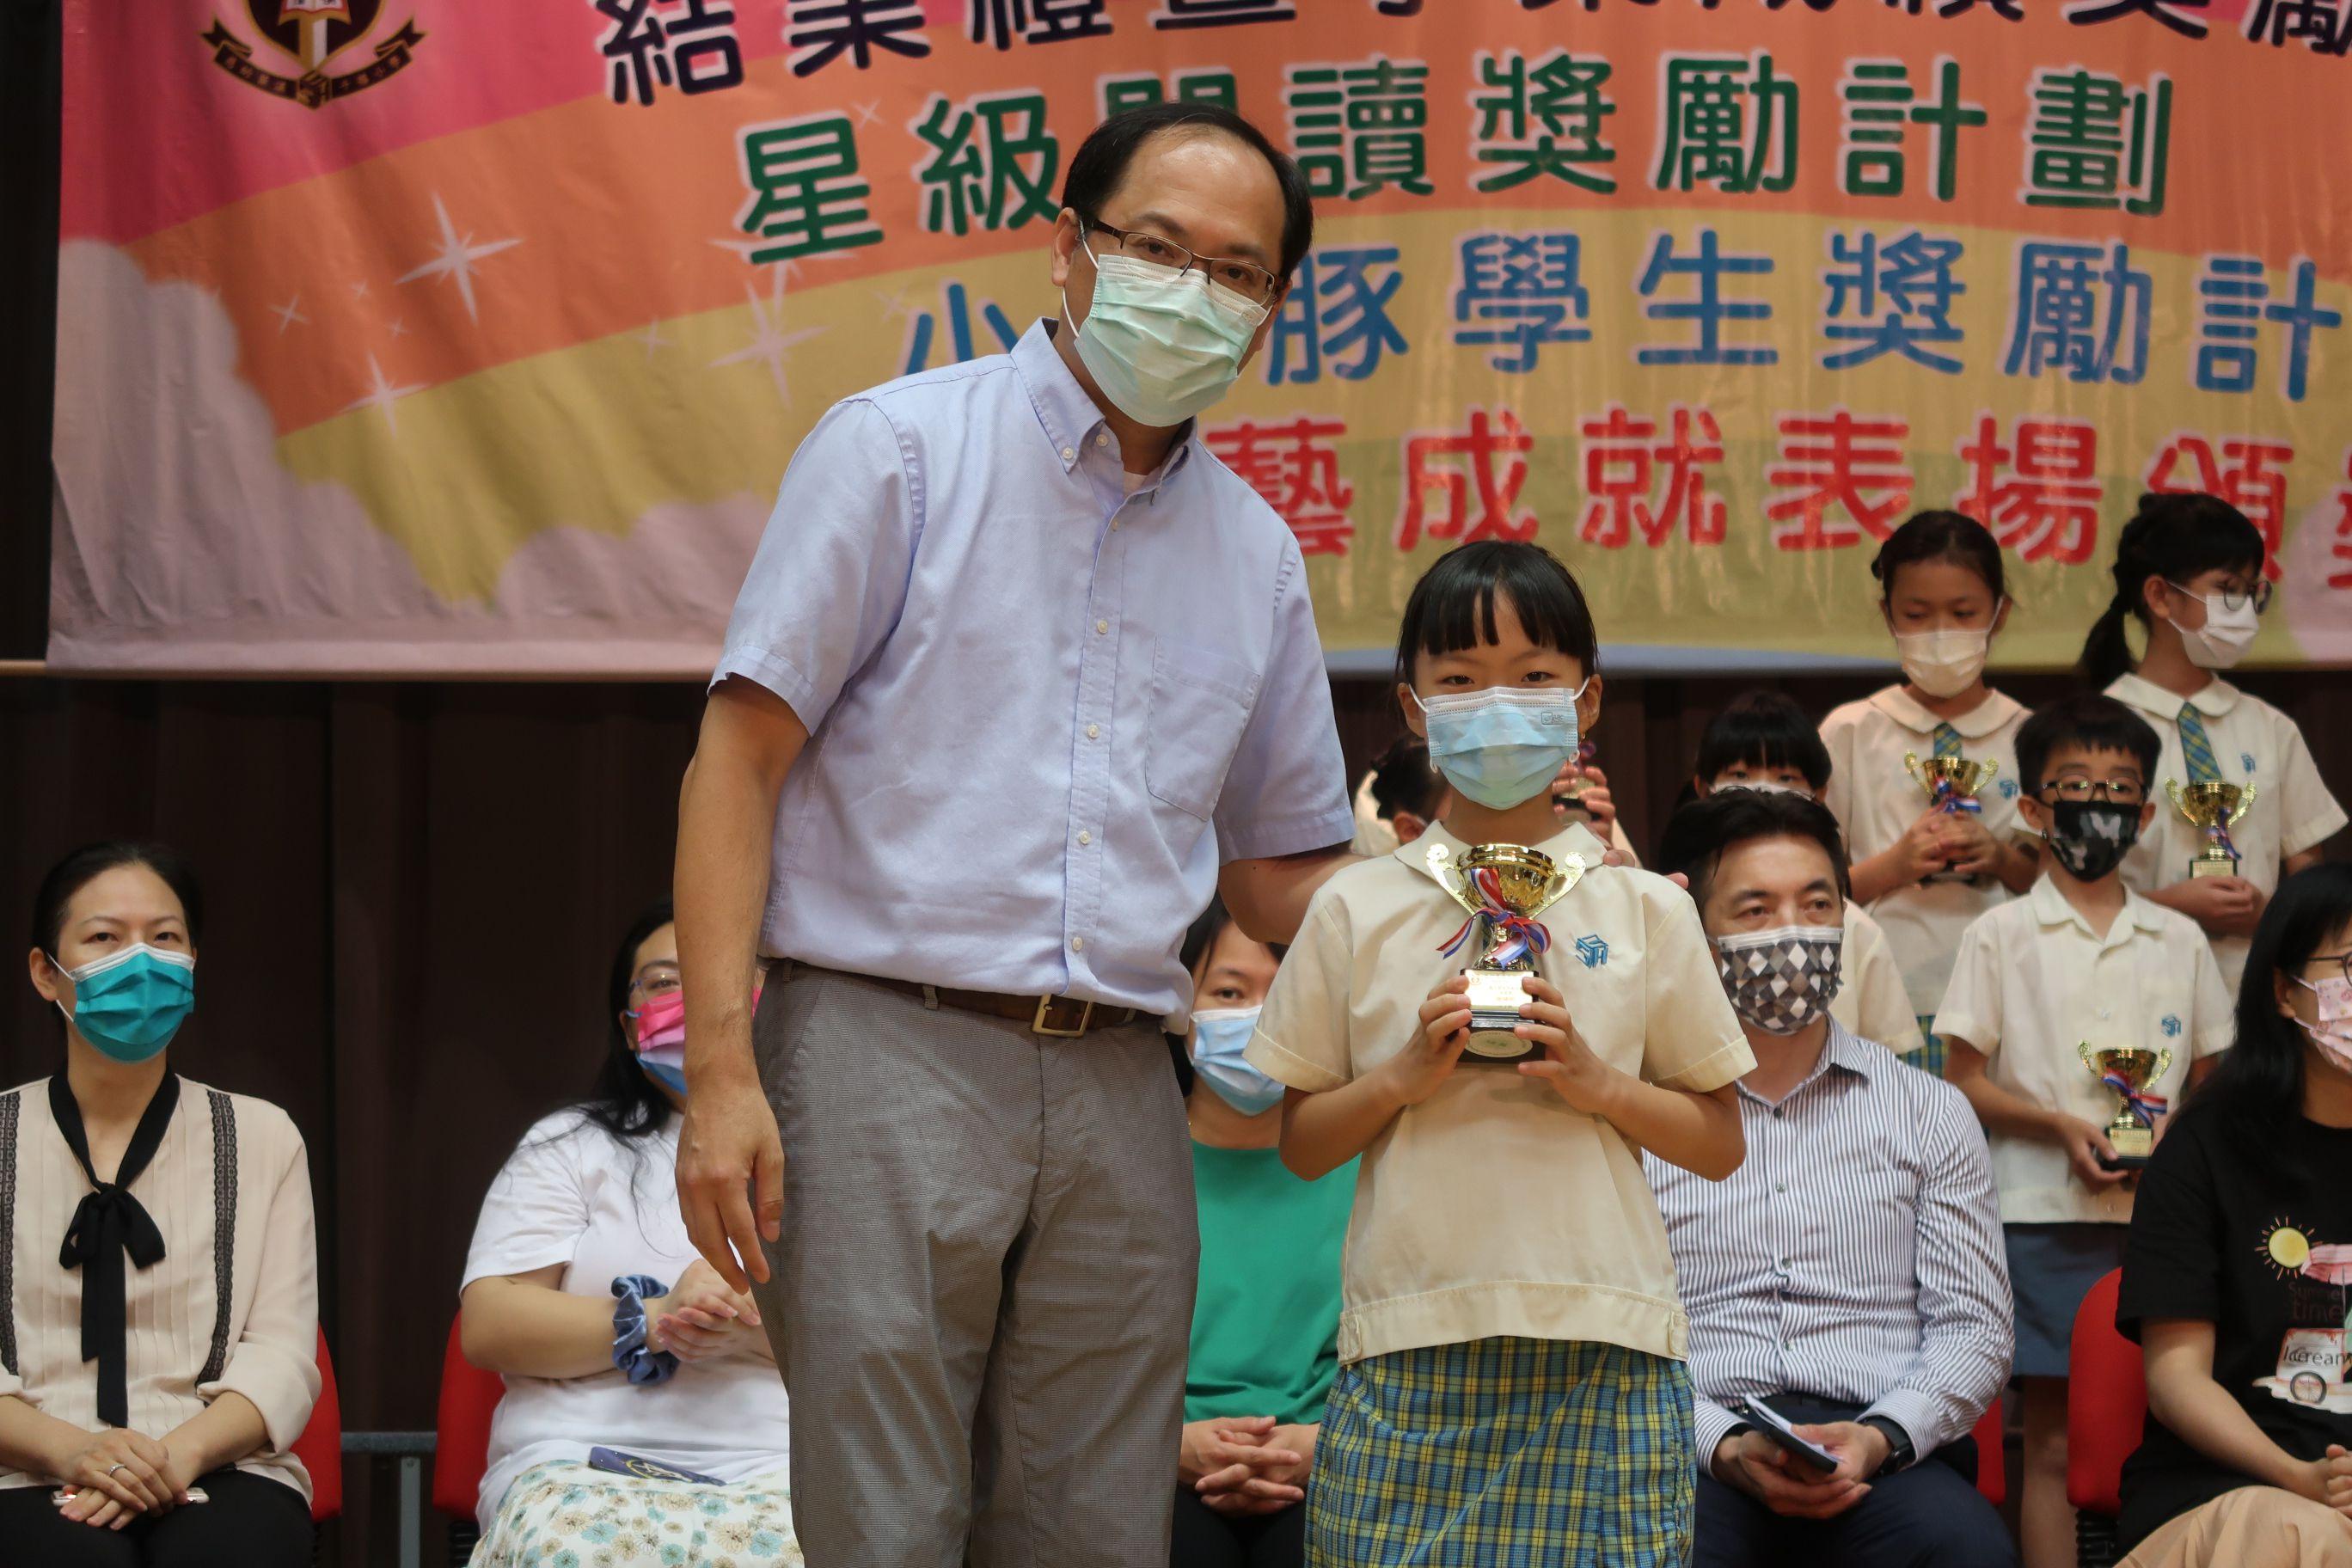 https://syh.edu.hk/sites/default/files/img_5858.jpg